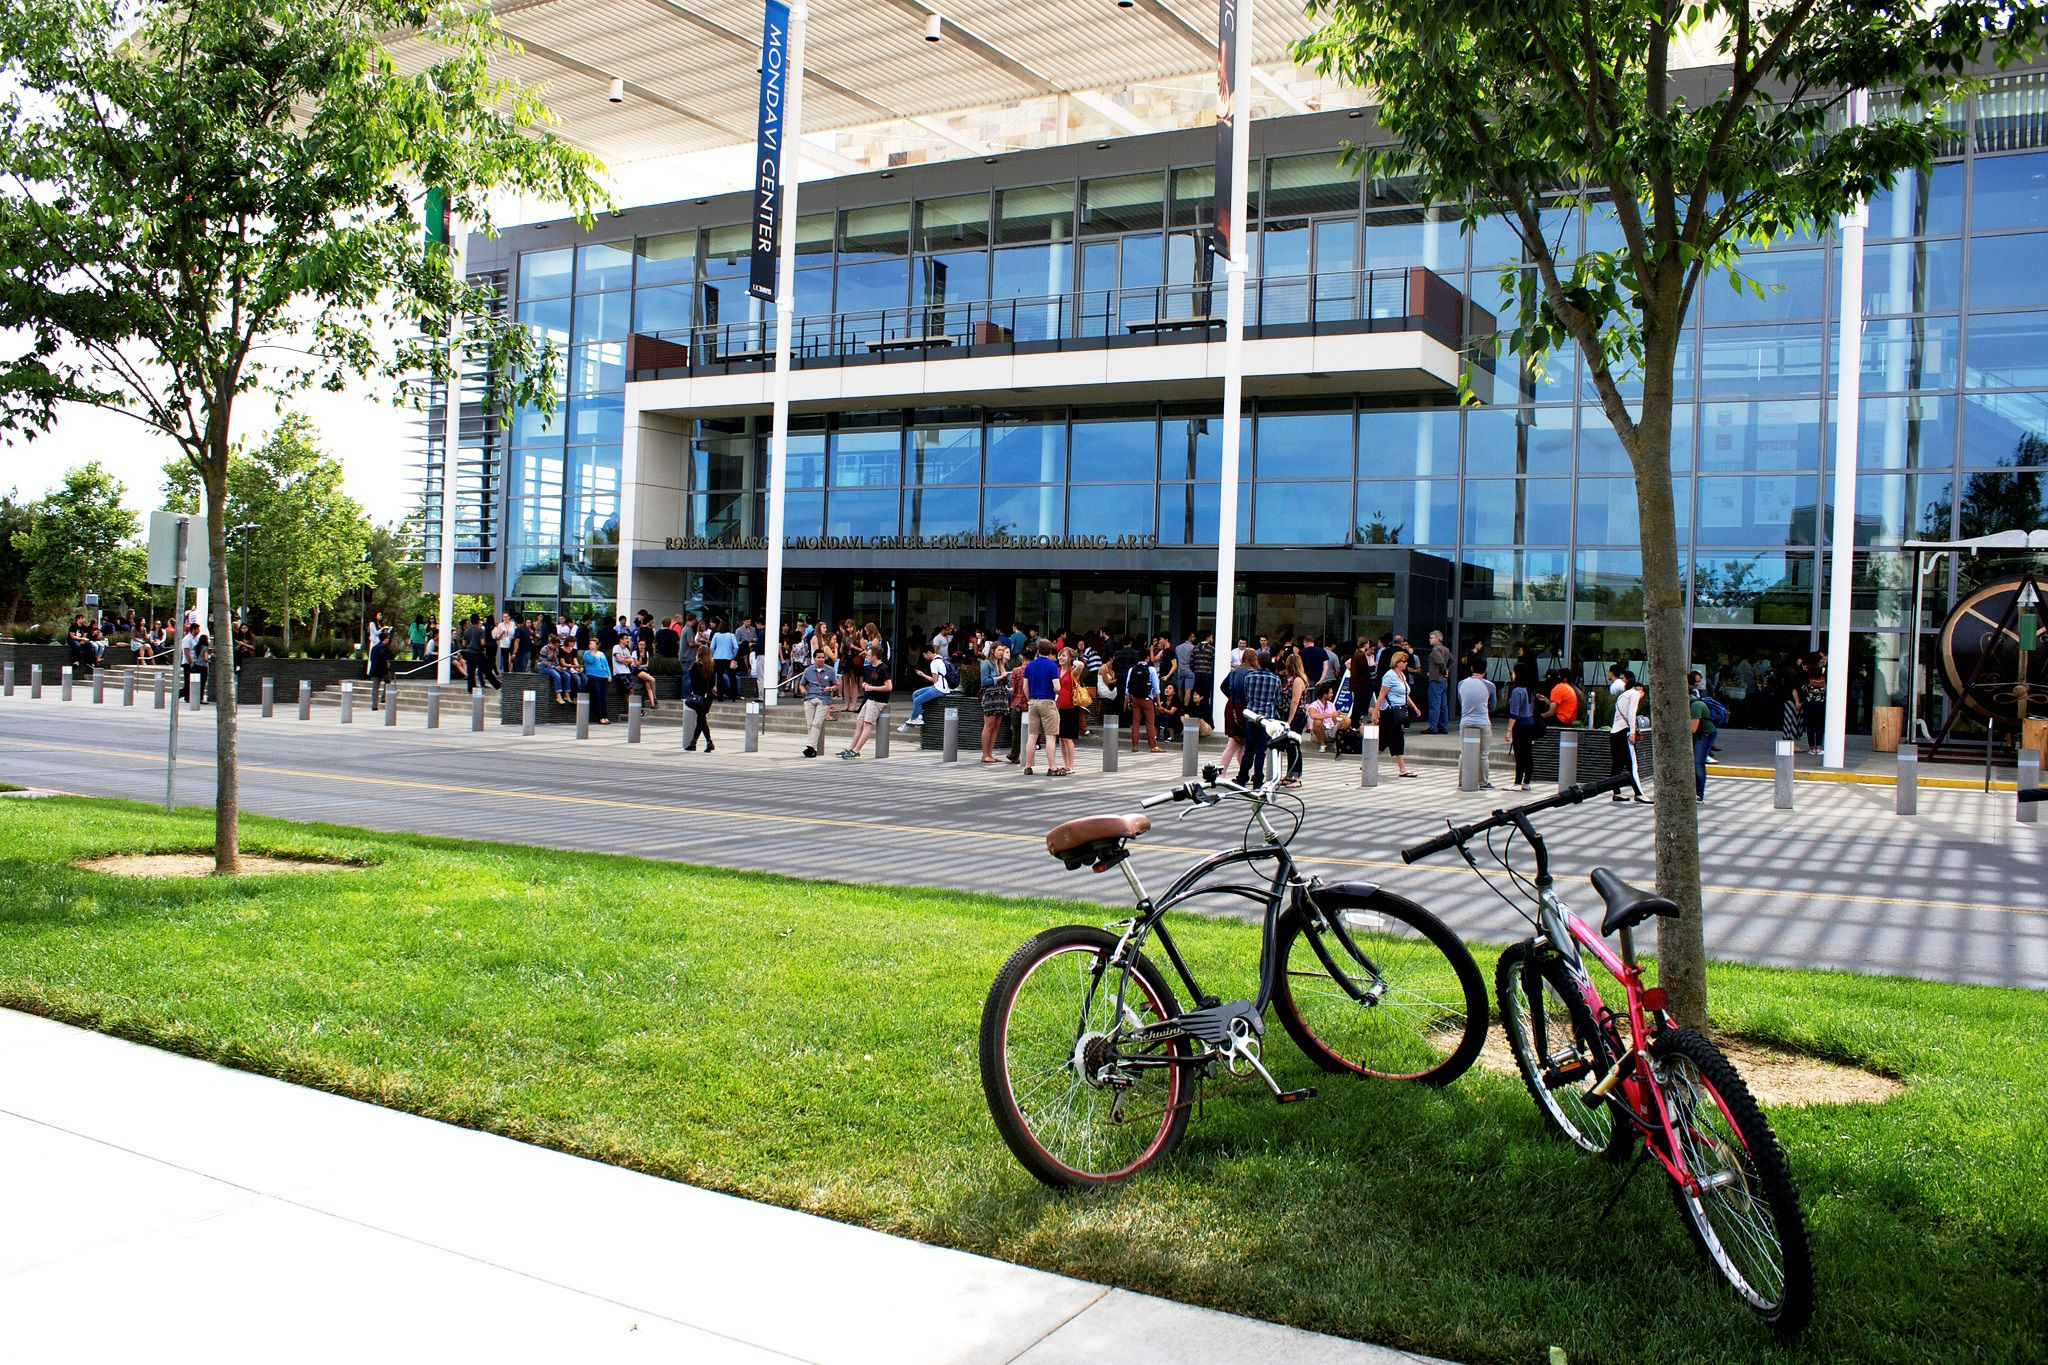 UC Davis Performing Arts Center